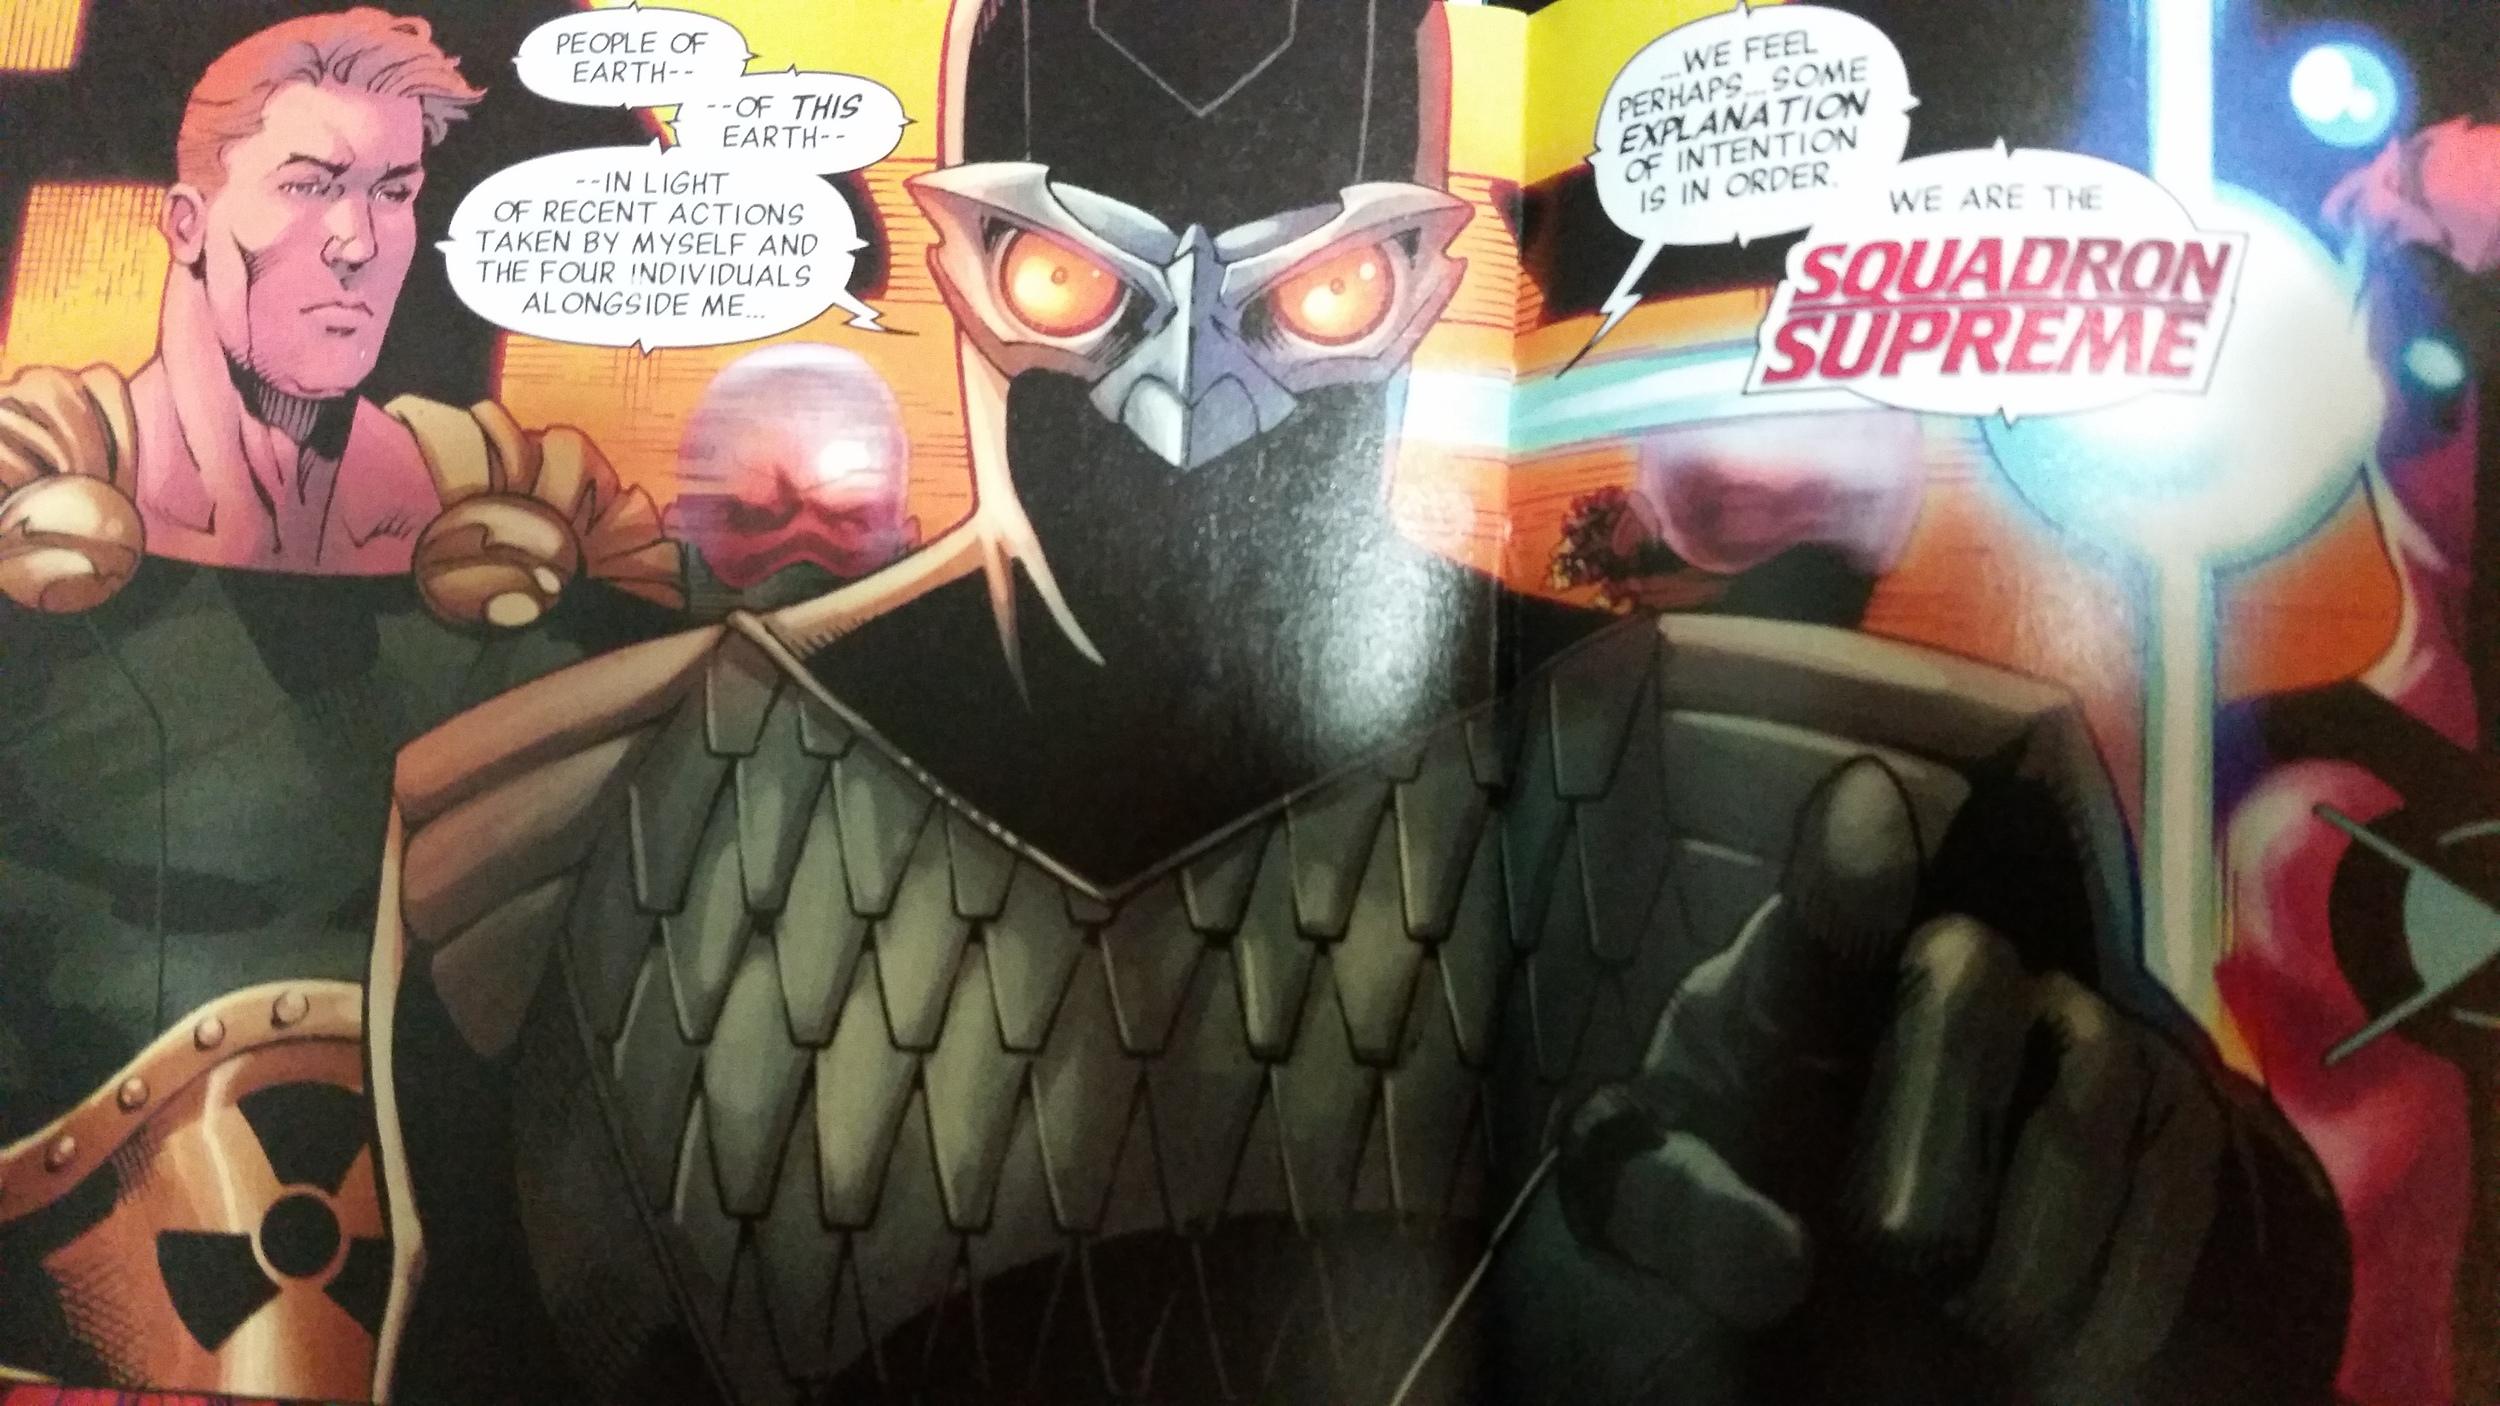 the nighthawk design is brilliant (Image courtesy of Marvel Comics